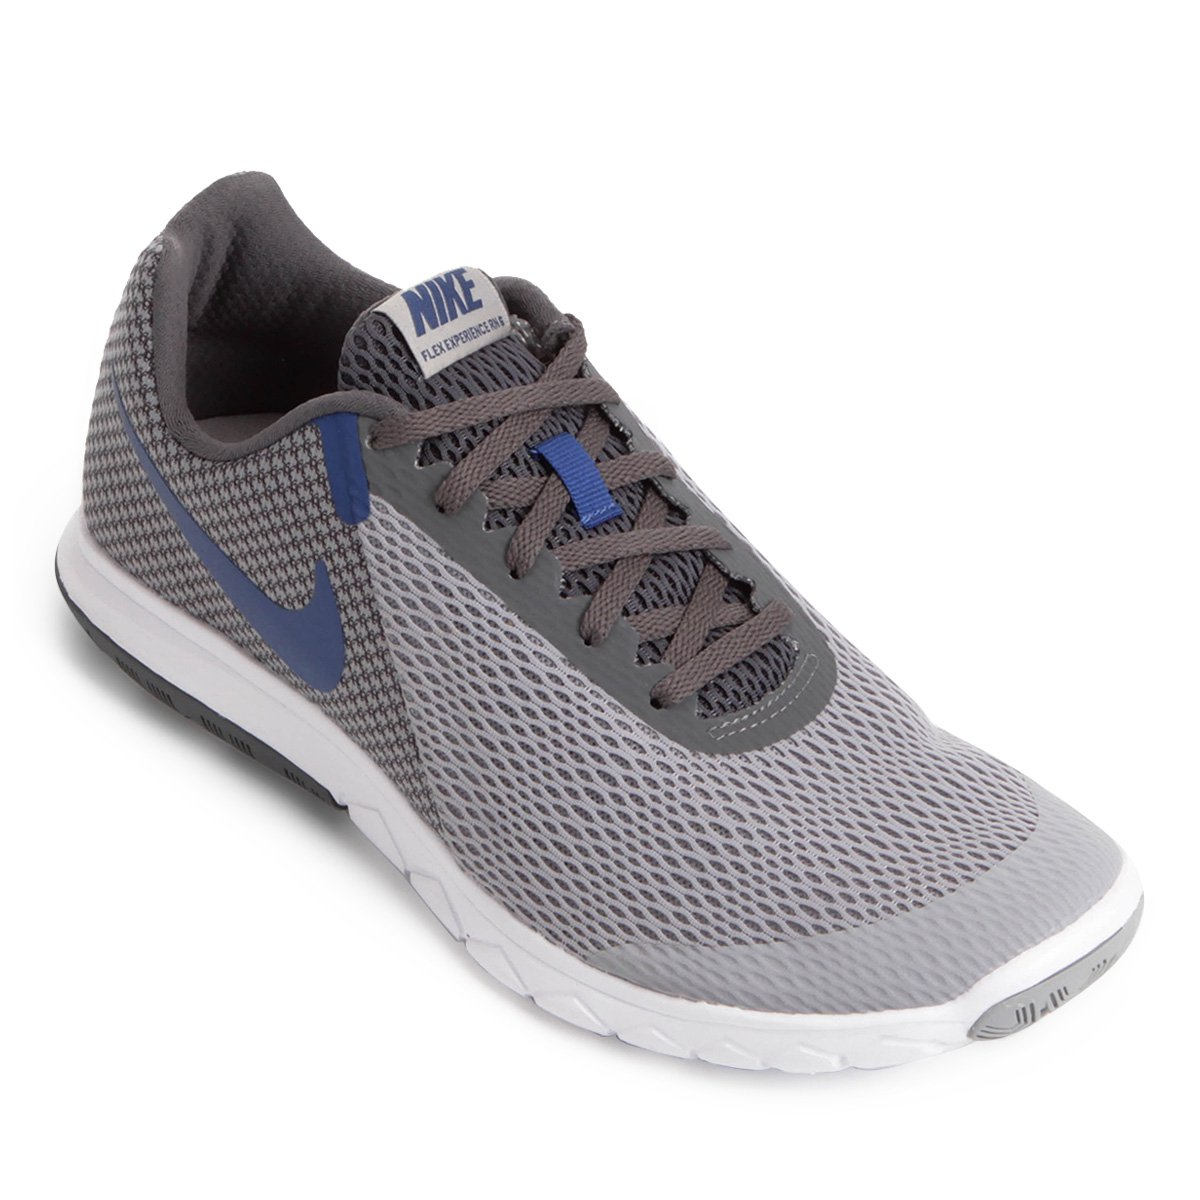 008819a9c5a6d Tênis Nike Flex Experience Rn 6 Masculino - Cinza e Azul - Compre Agora